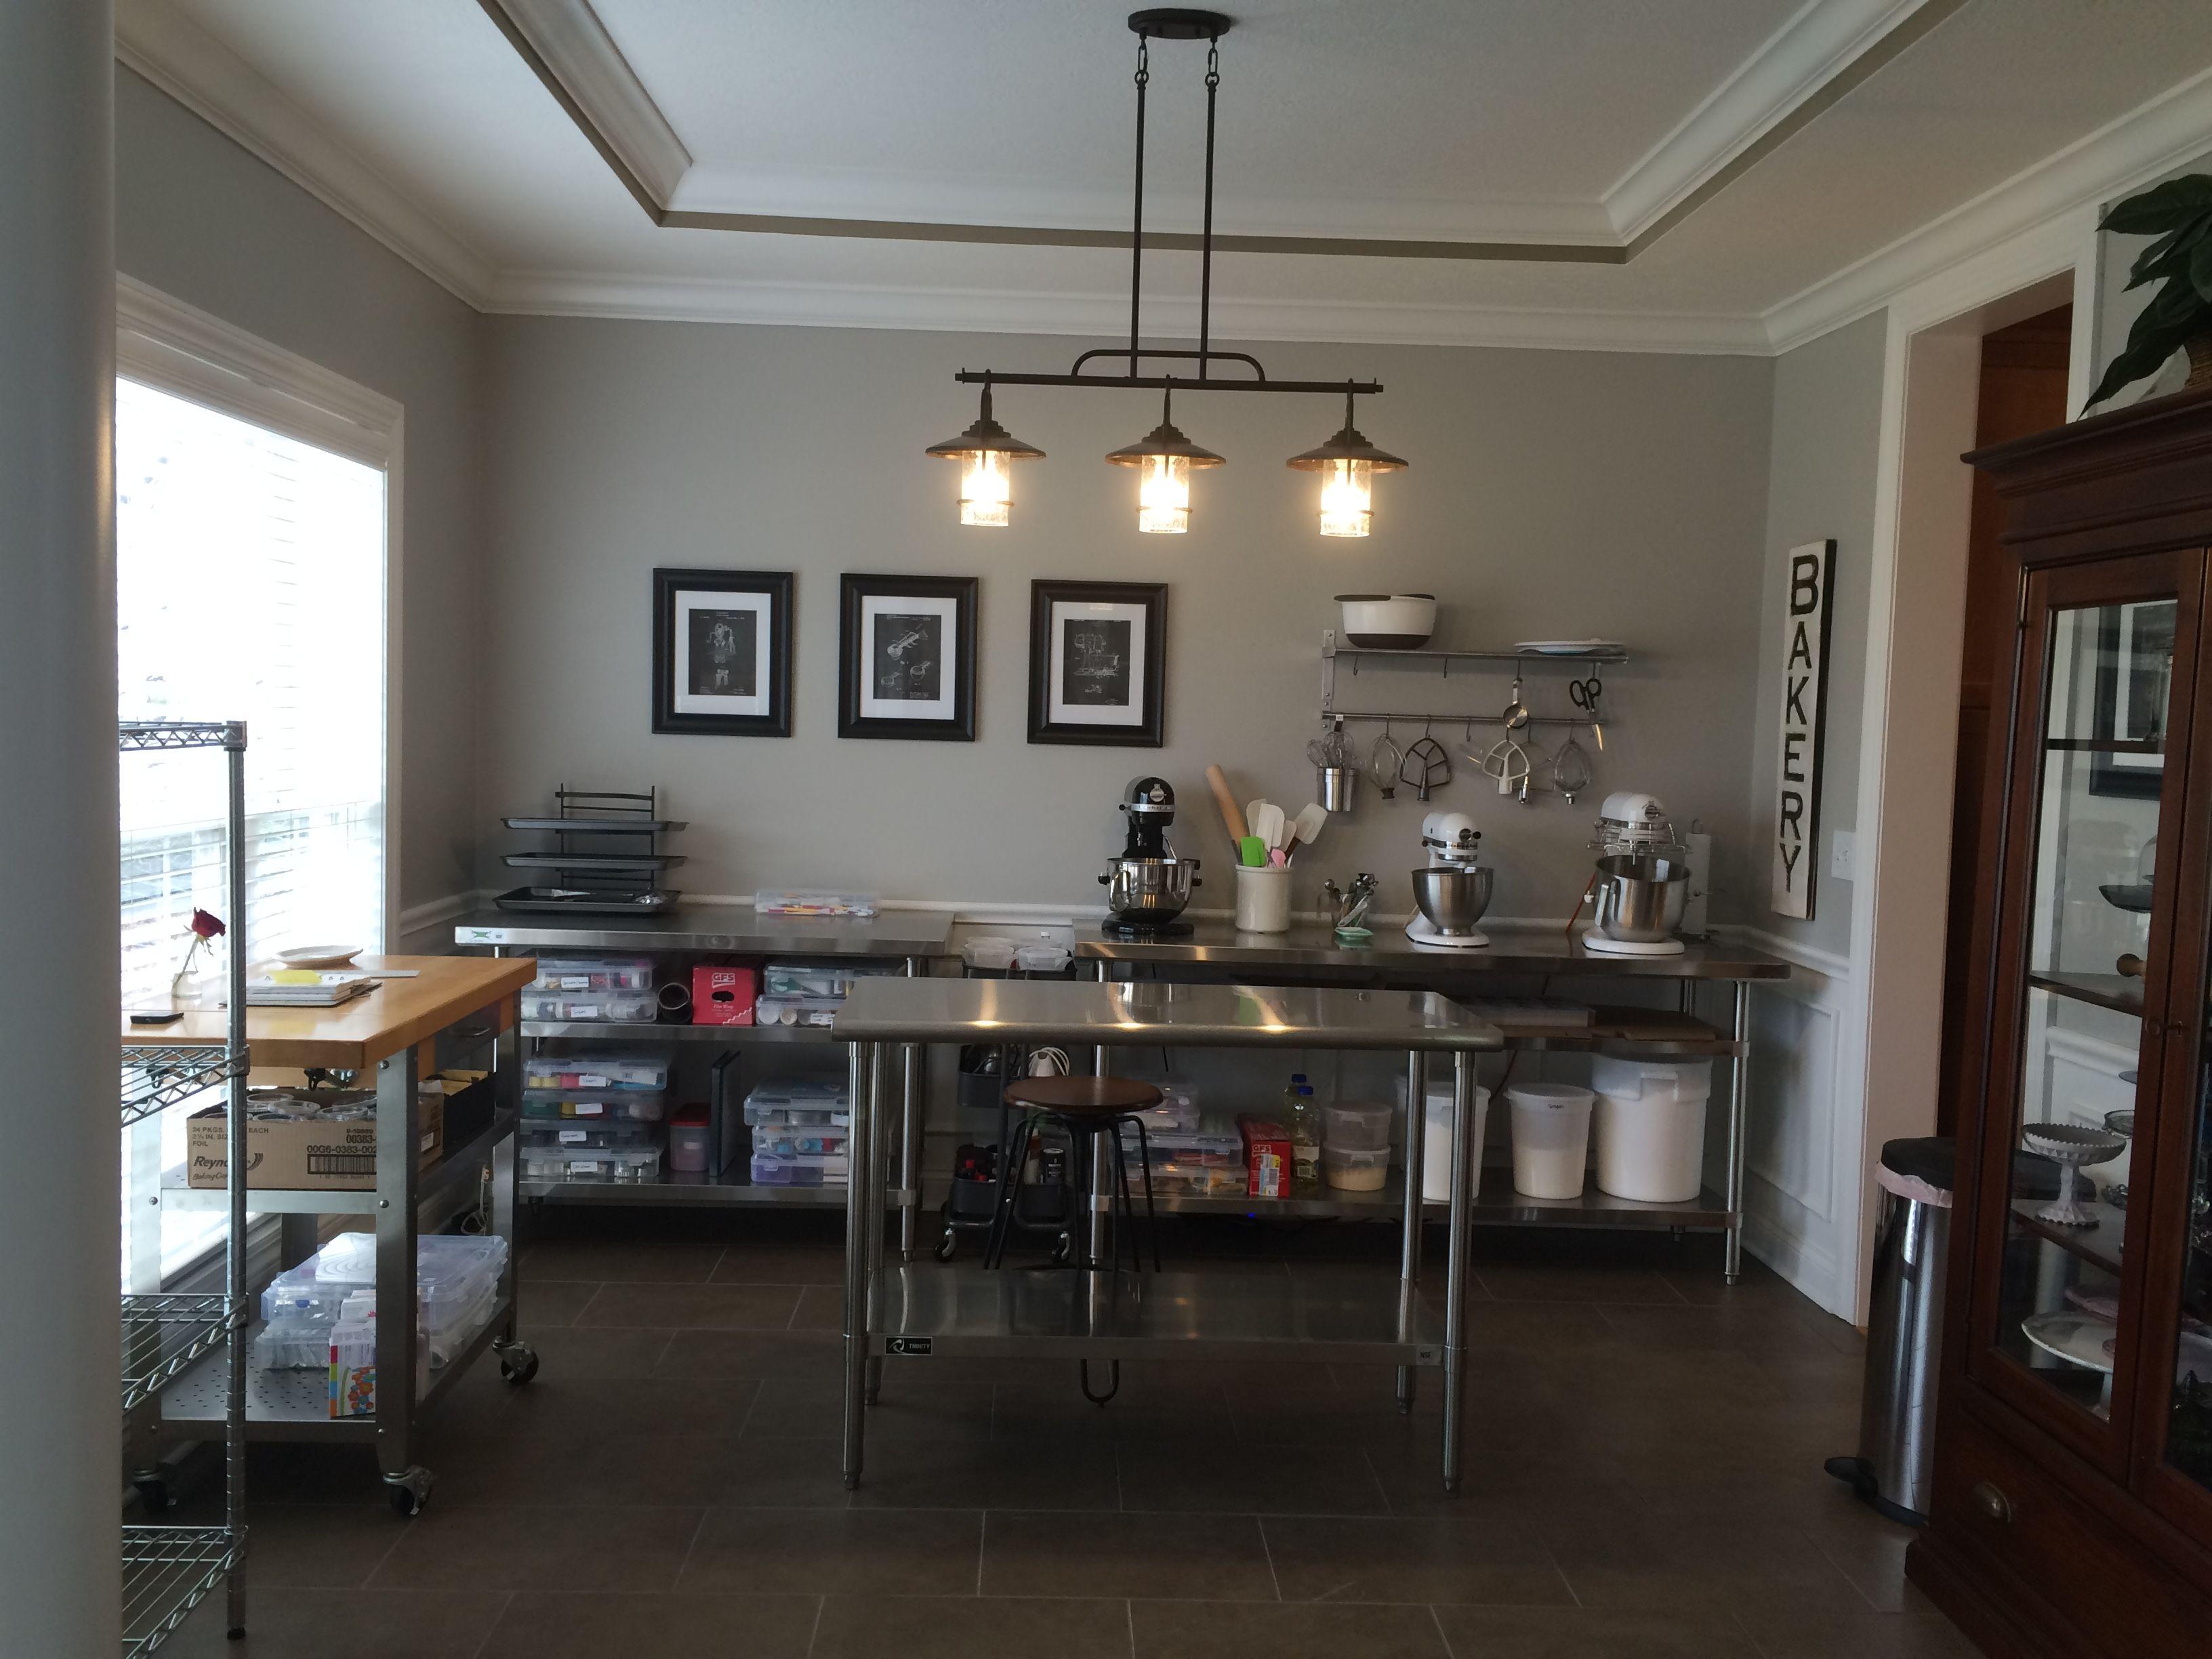 Repurposed My Formal Dining Room Home Bakery Prep Area